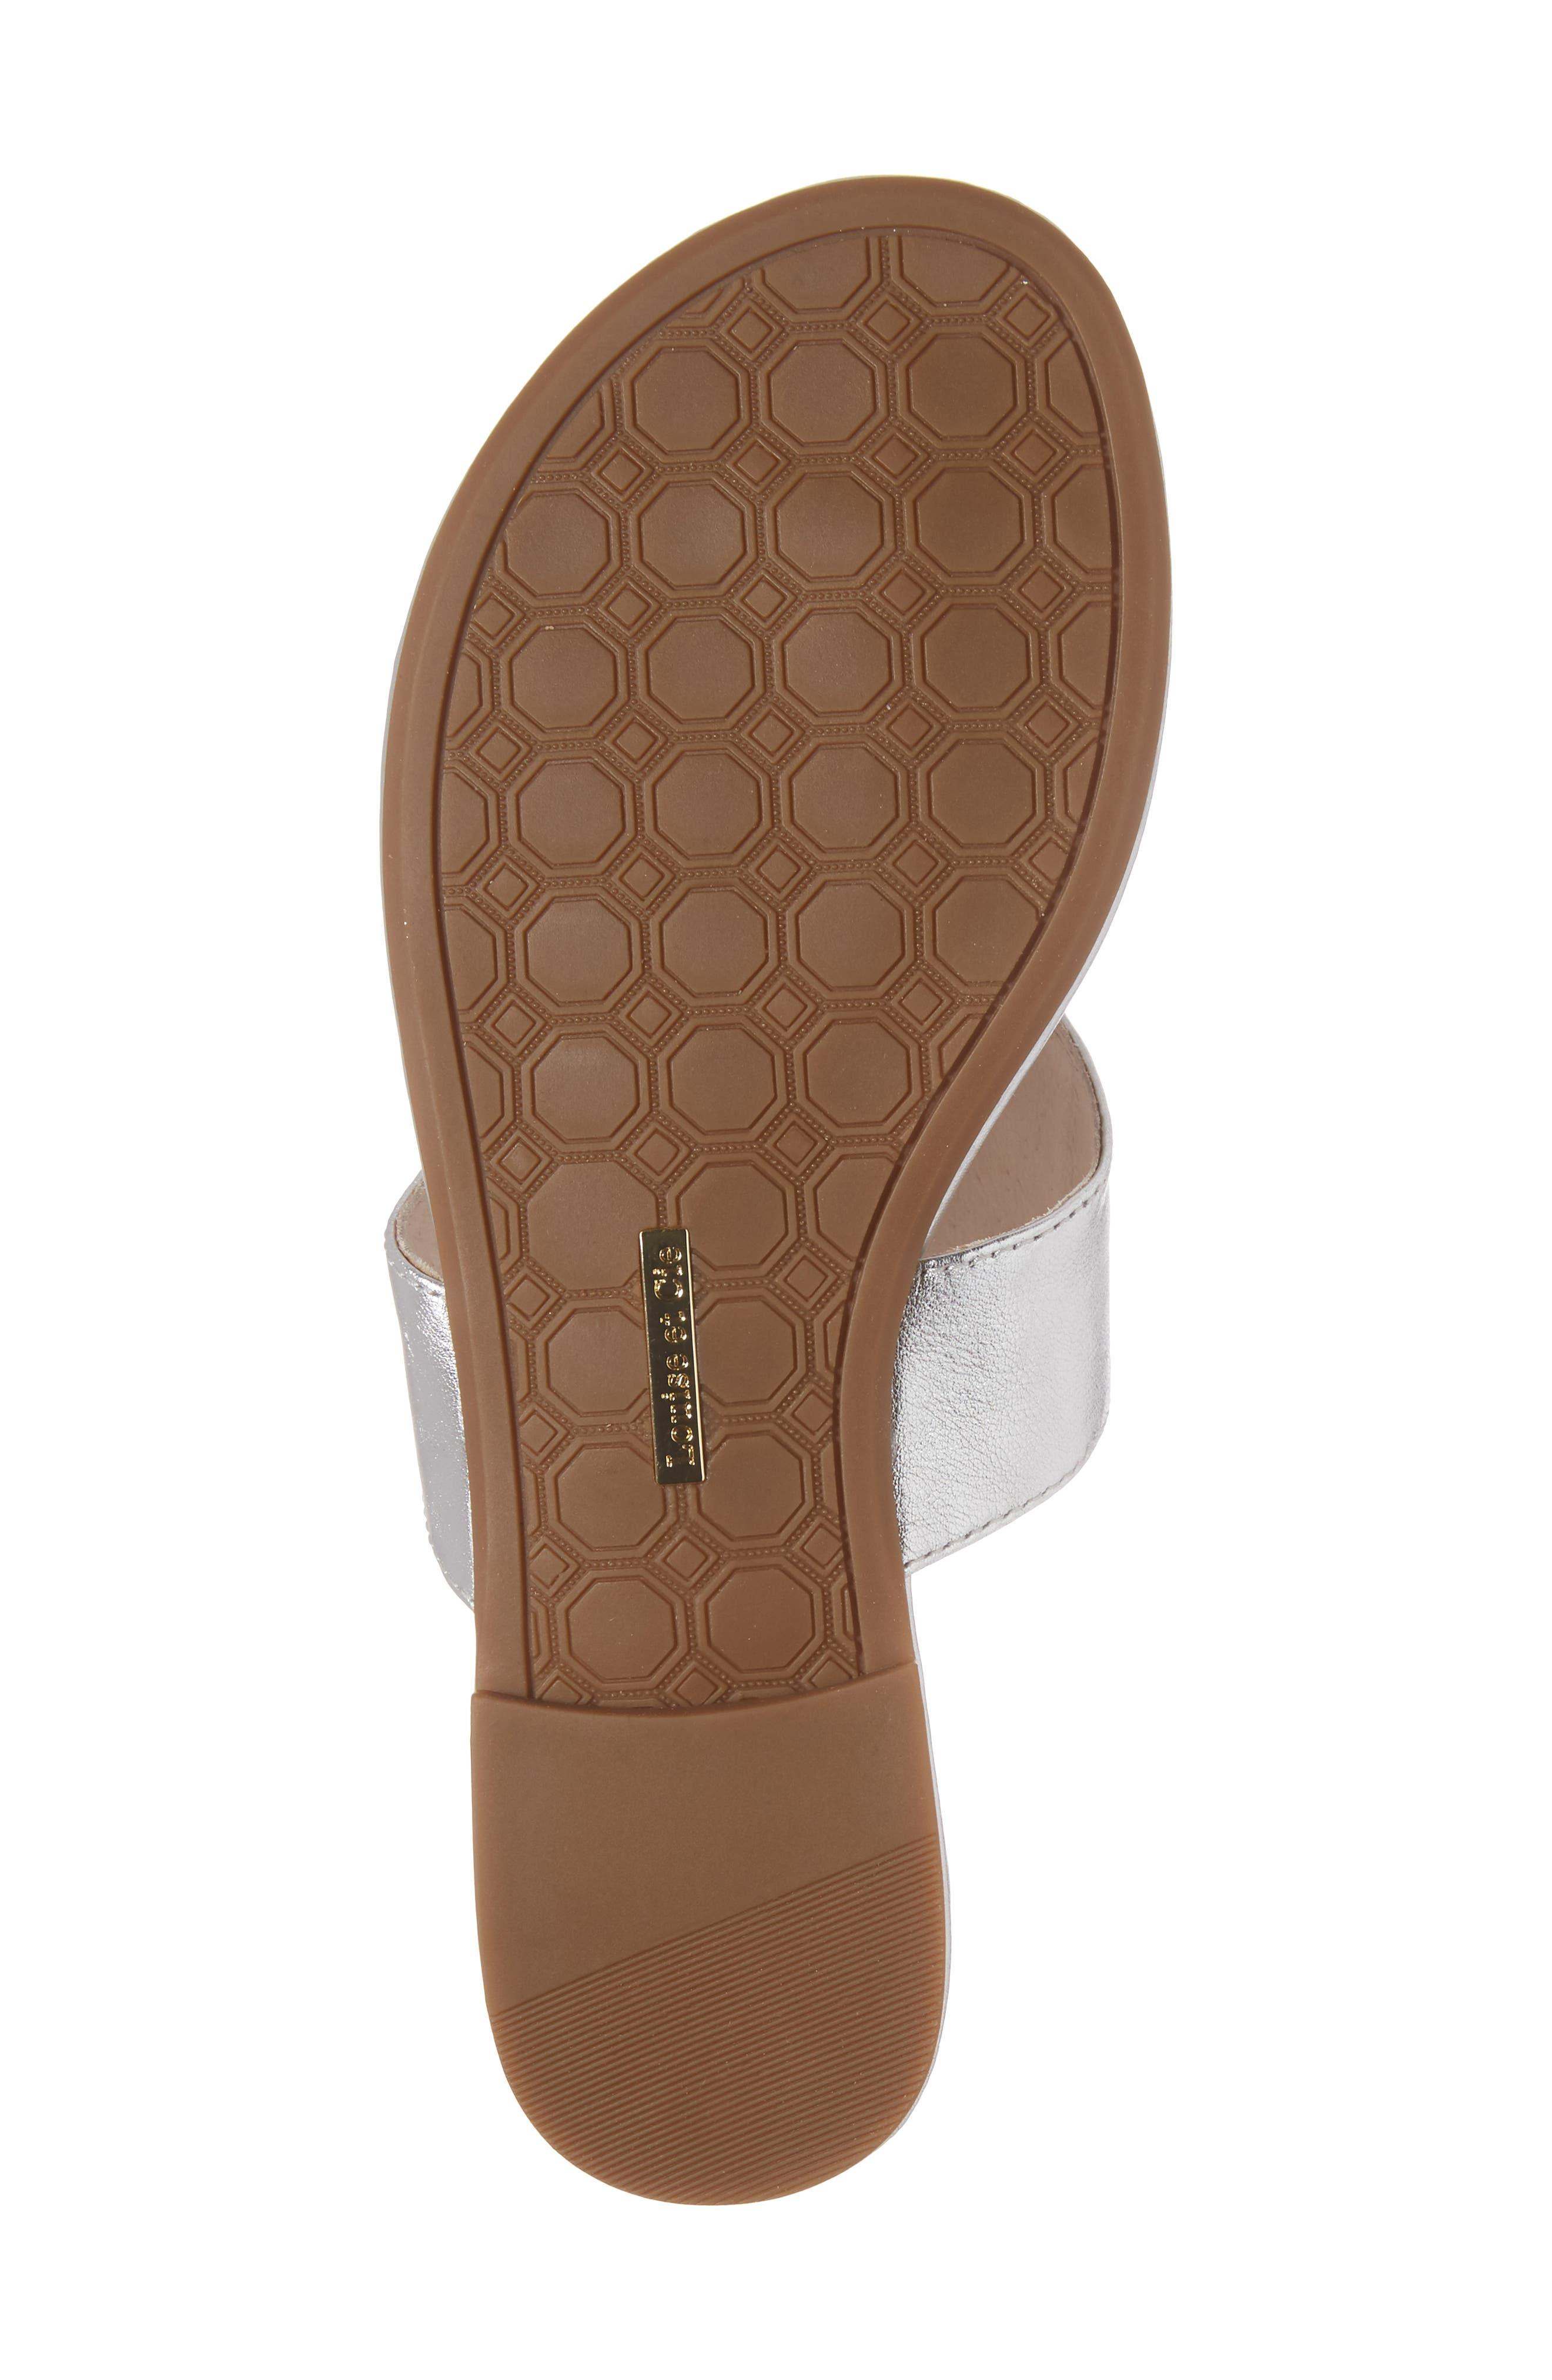 Adana Flip Flop,                             Alternate thumbnail 6, color,                             Sterling Leather